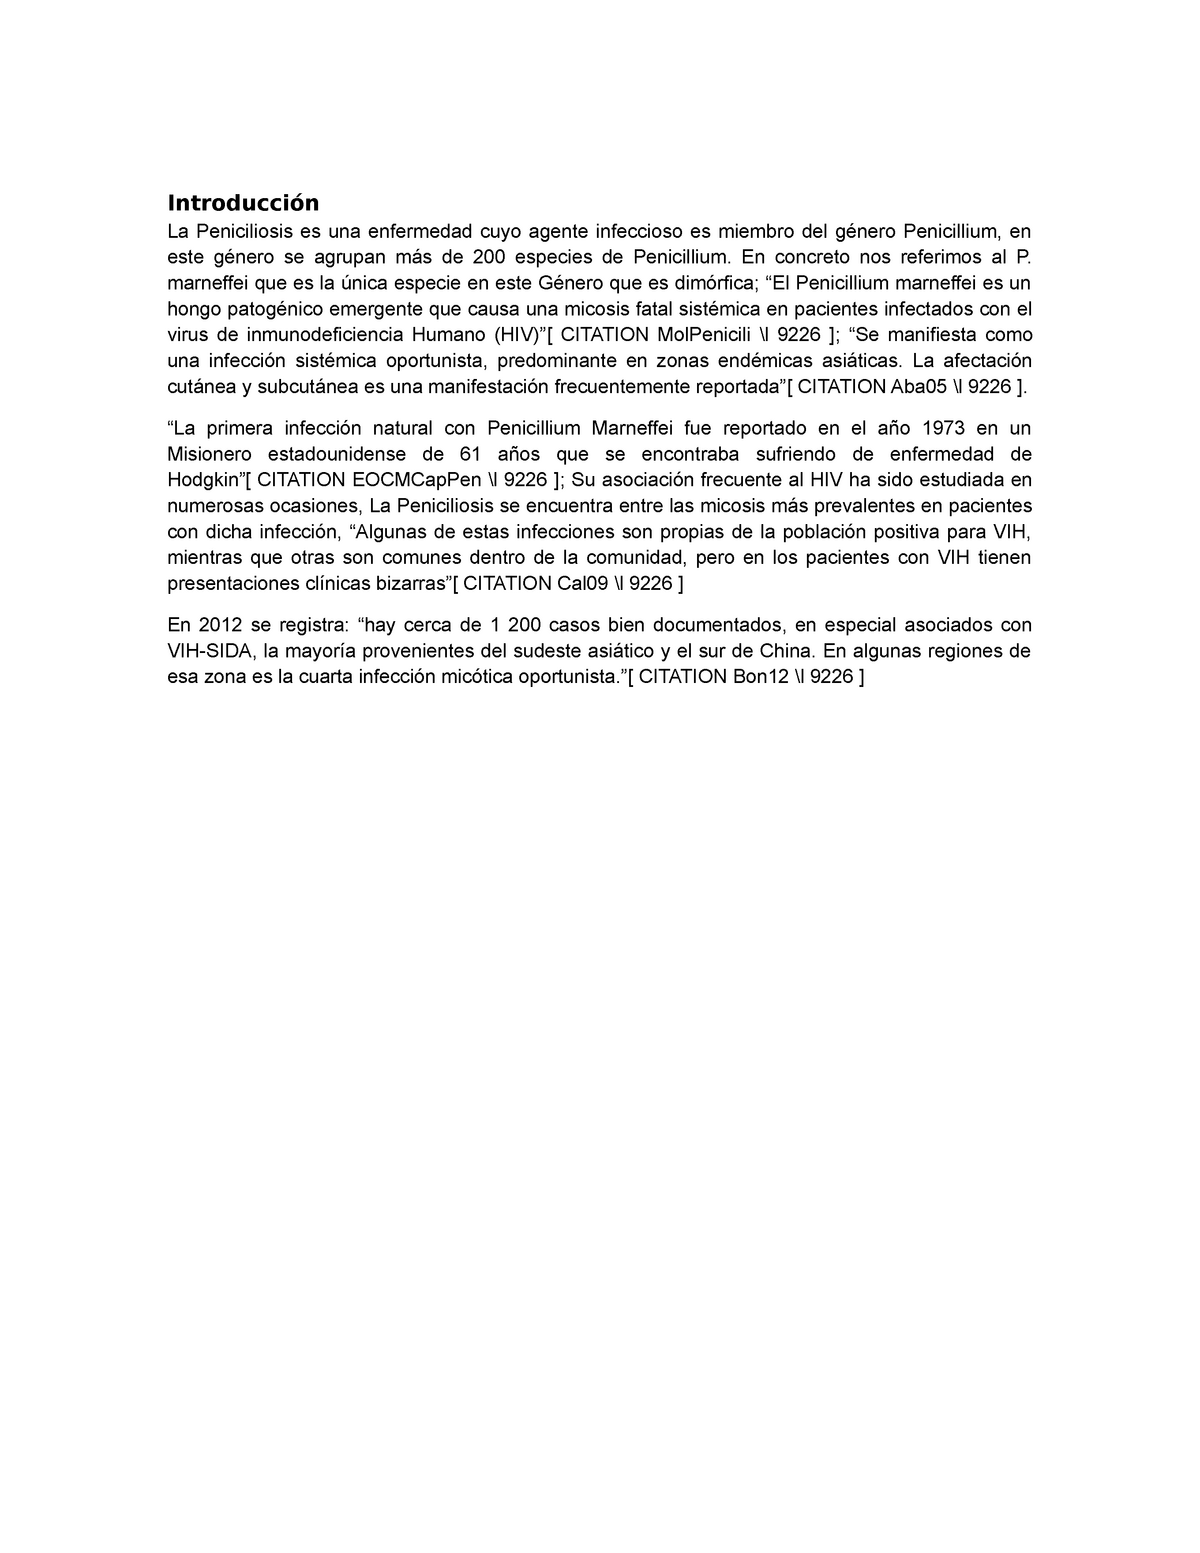 infección parasitaria oportunista en casos de sida